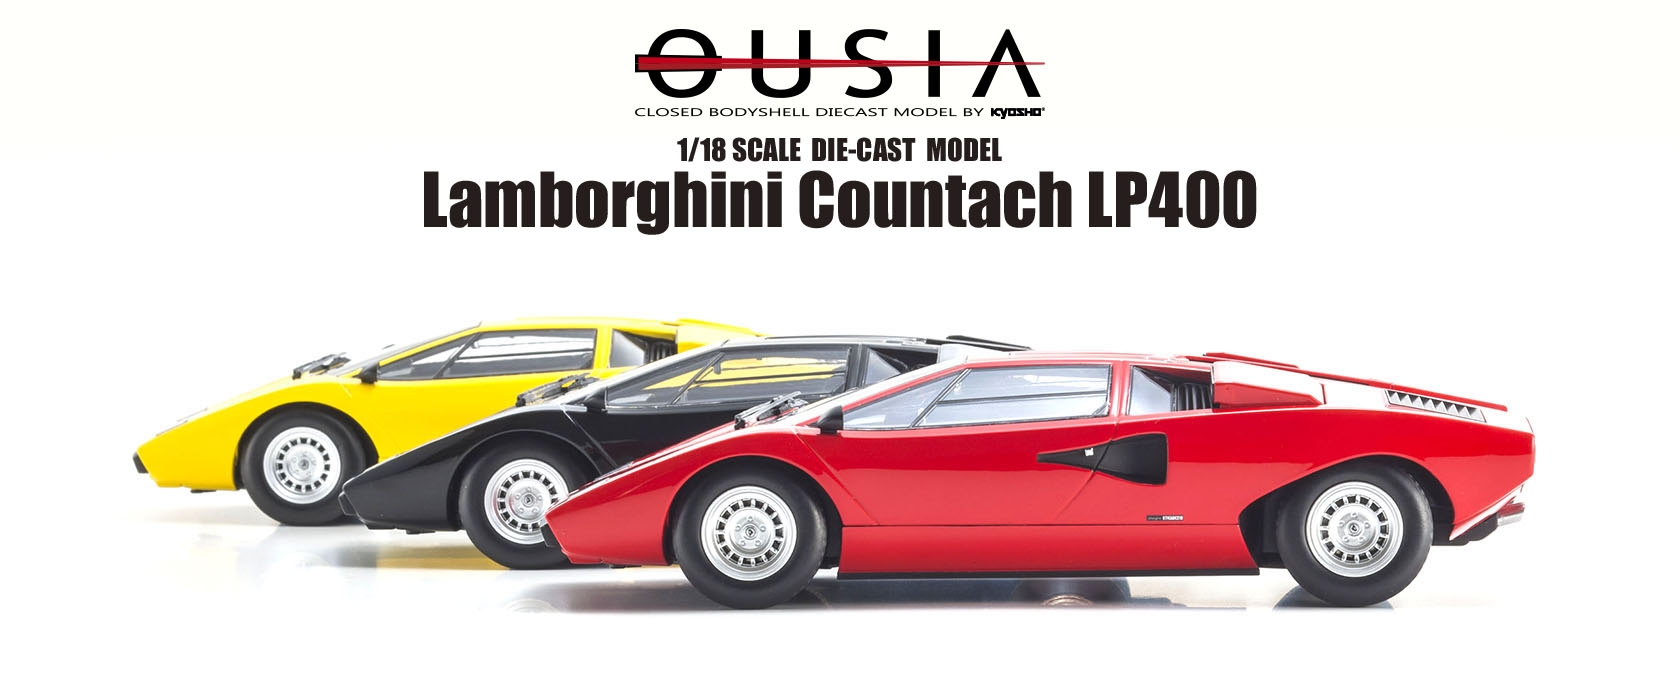 ousia-LP400